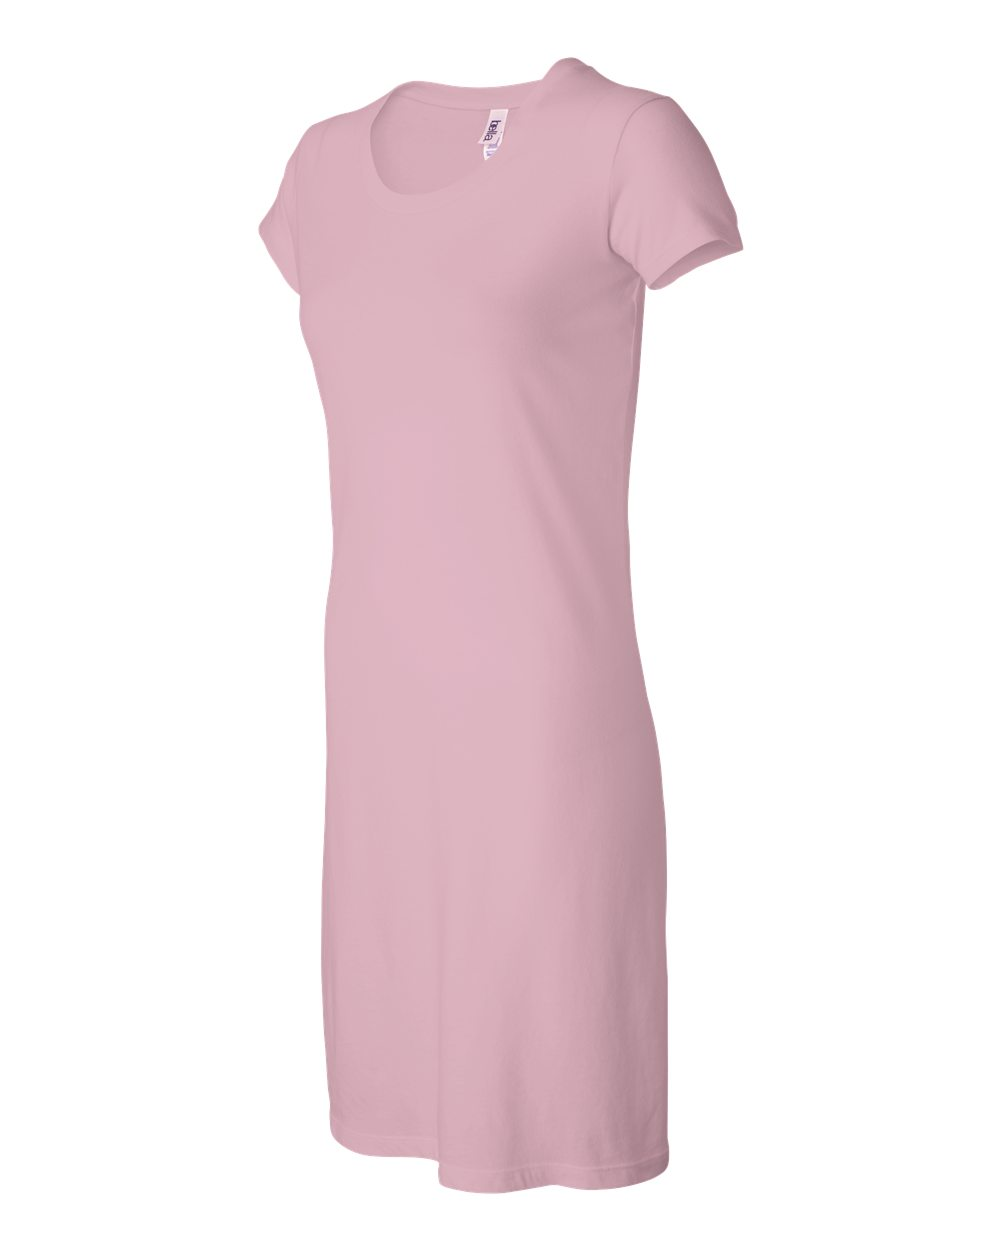 Bella 8412 Soft Pink